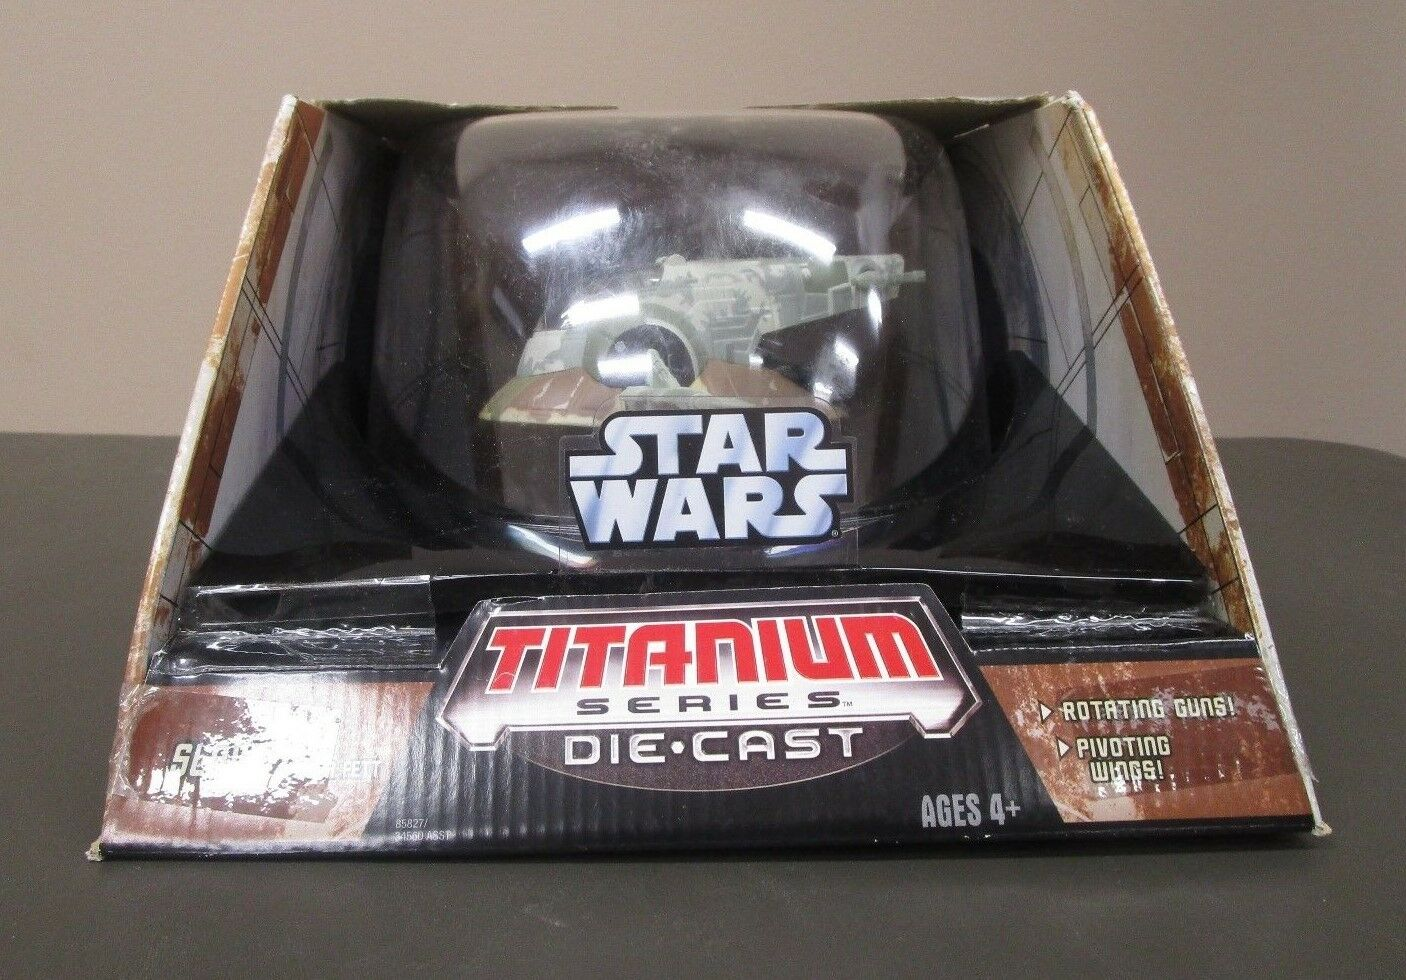 Boba Fett Slave 1 2006 STAR WARS Titanium Series Die Cast MIB 7 Large Ultra